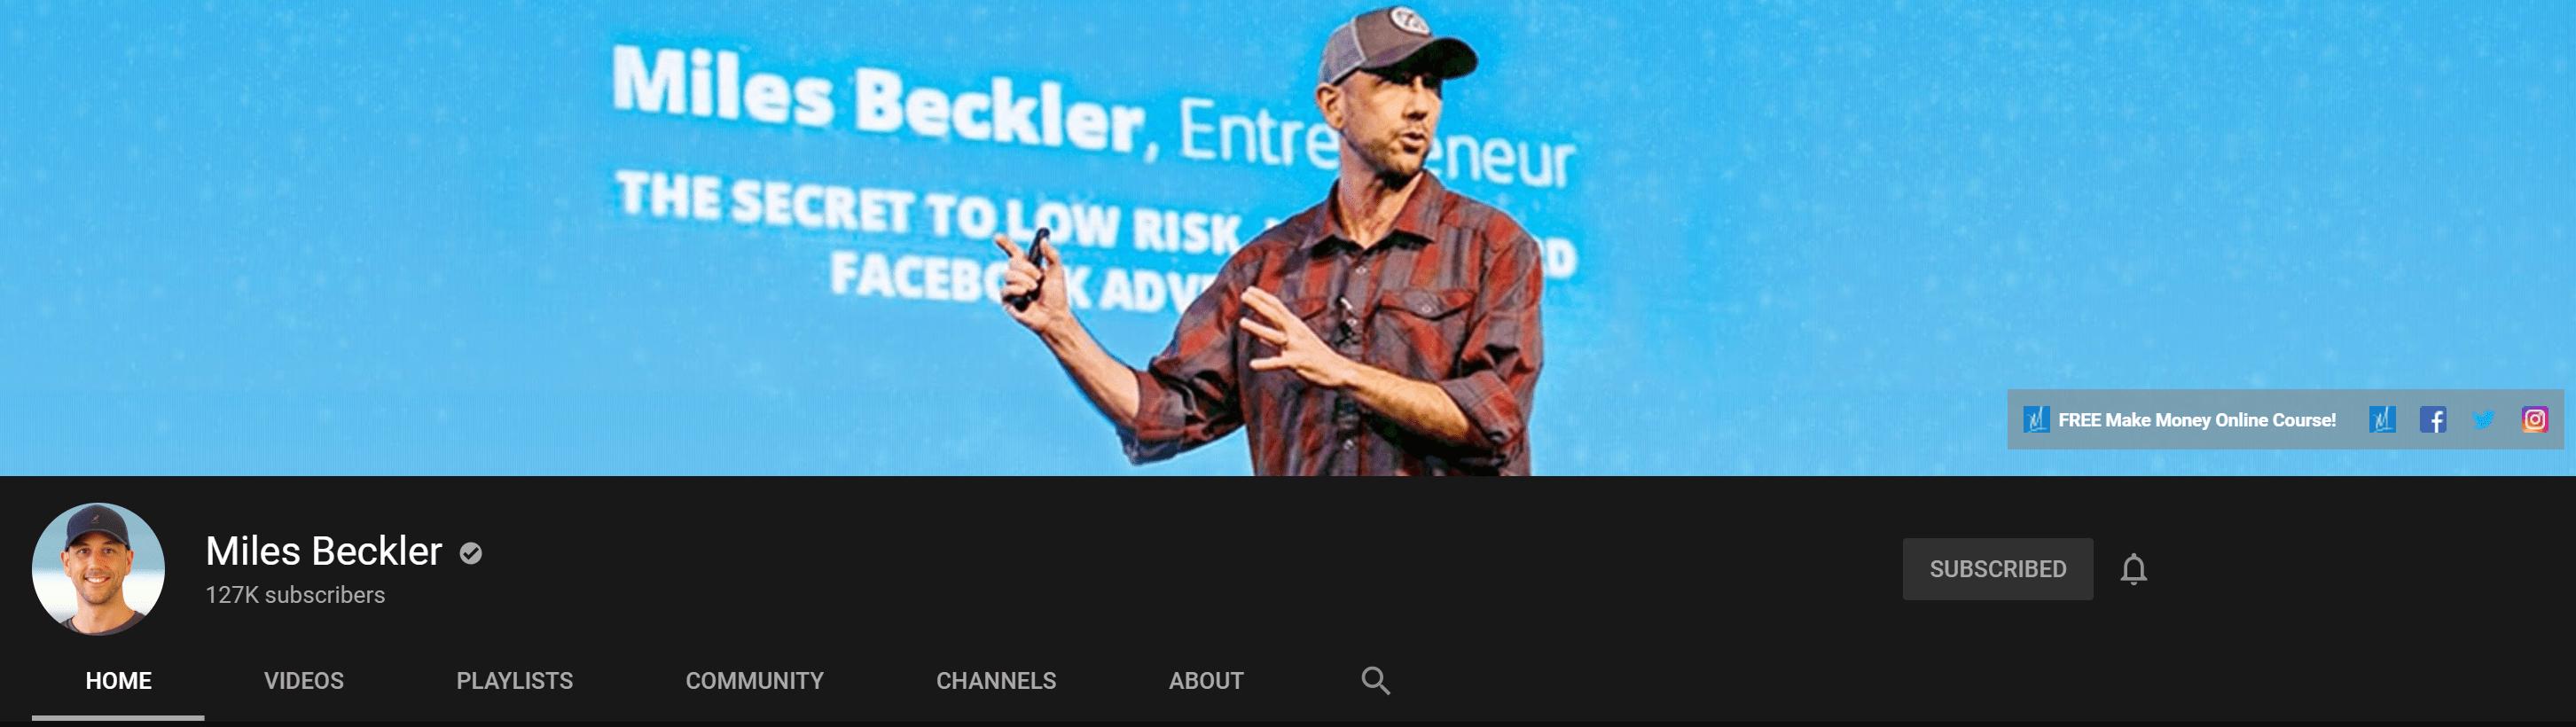 Miles Beckler Youtube Channel